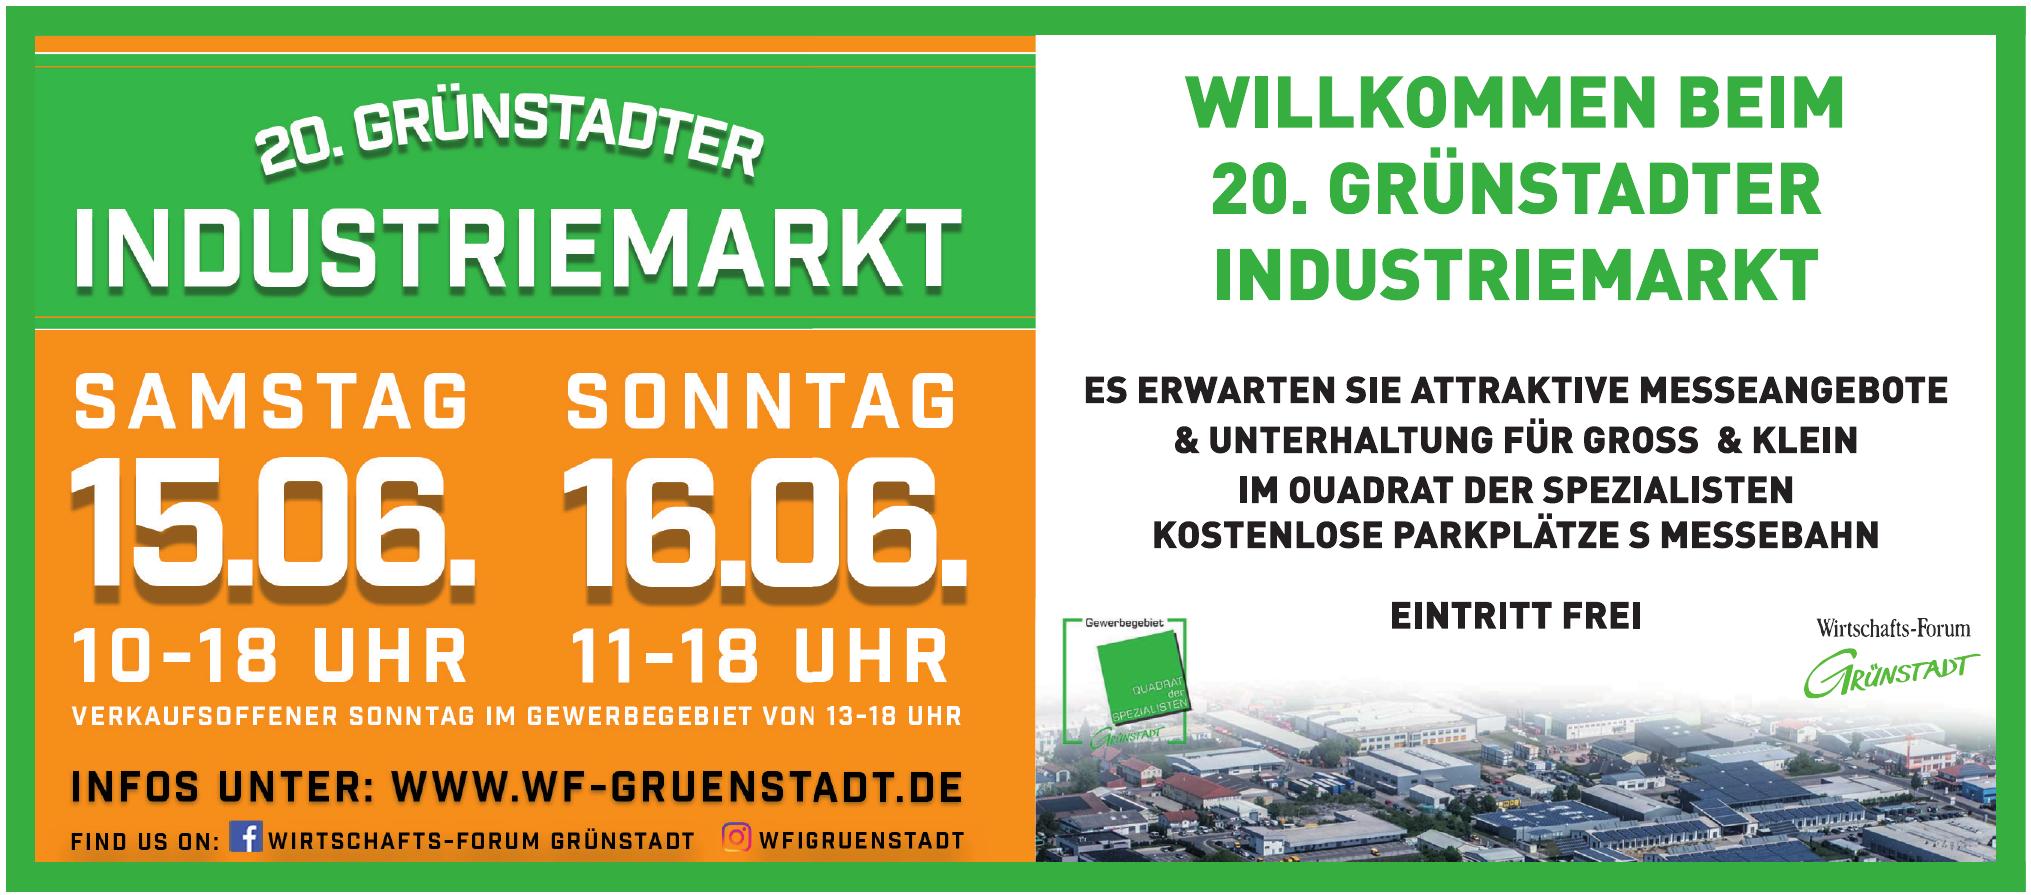 Wirtschafts-Forum Grünstadt e.V.